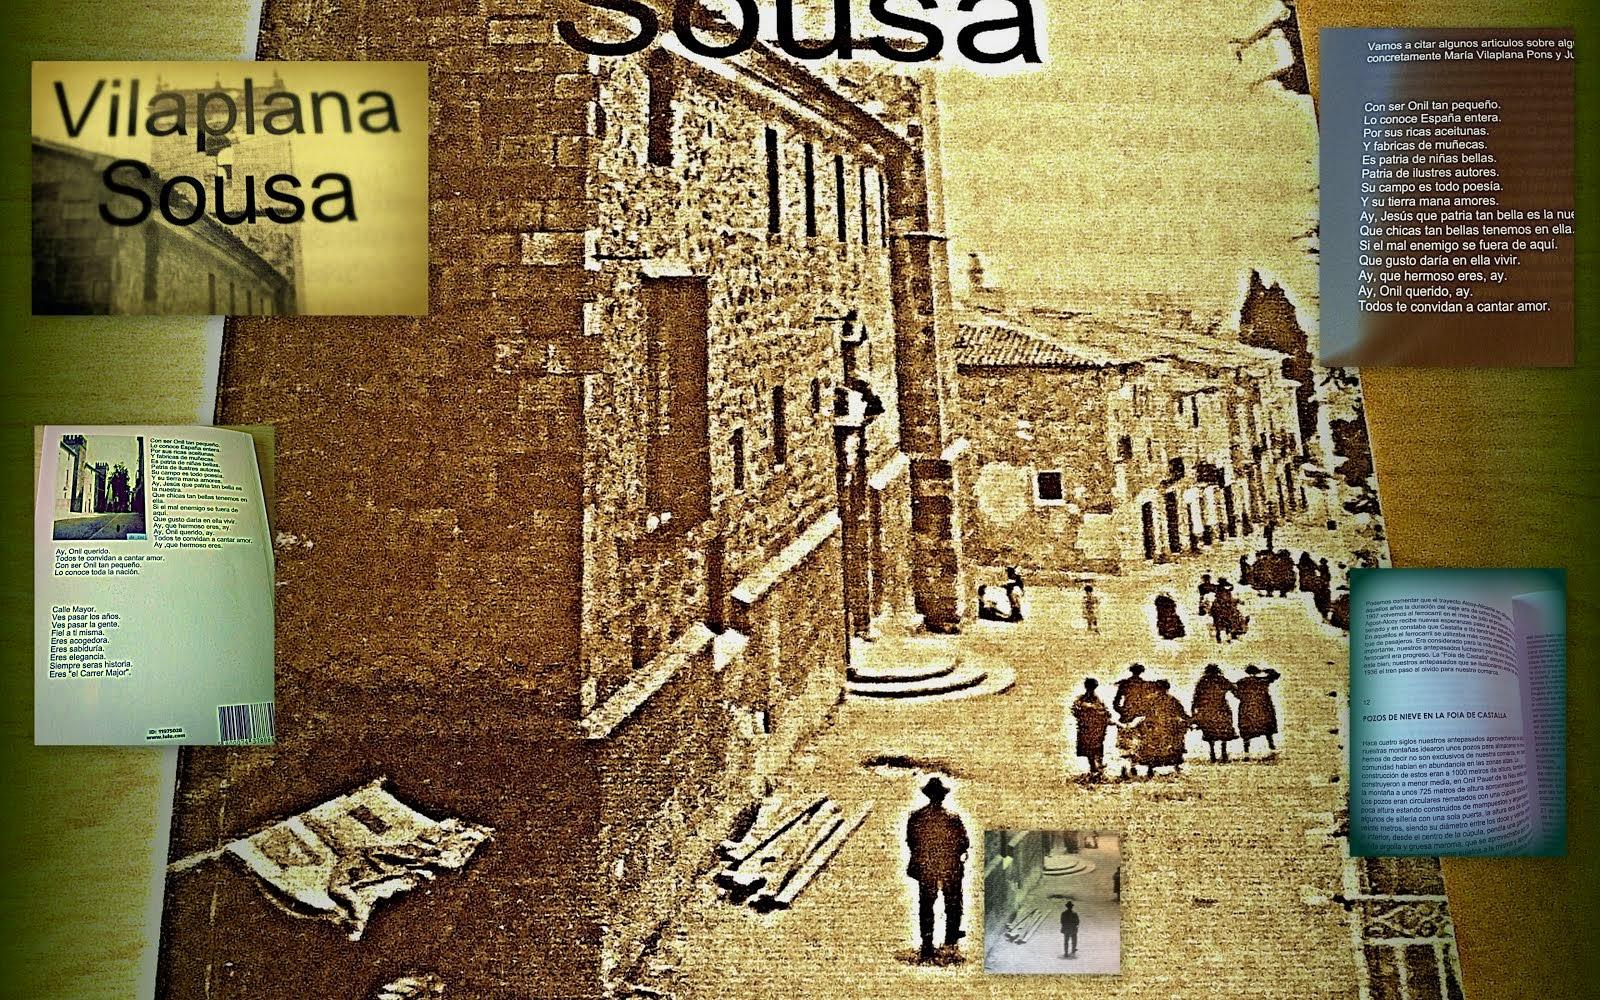 Vilaplana Sousa